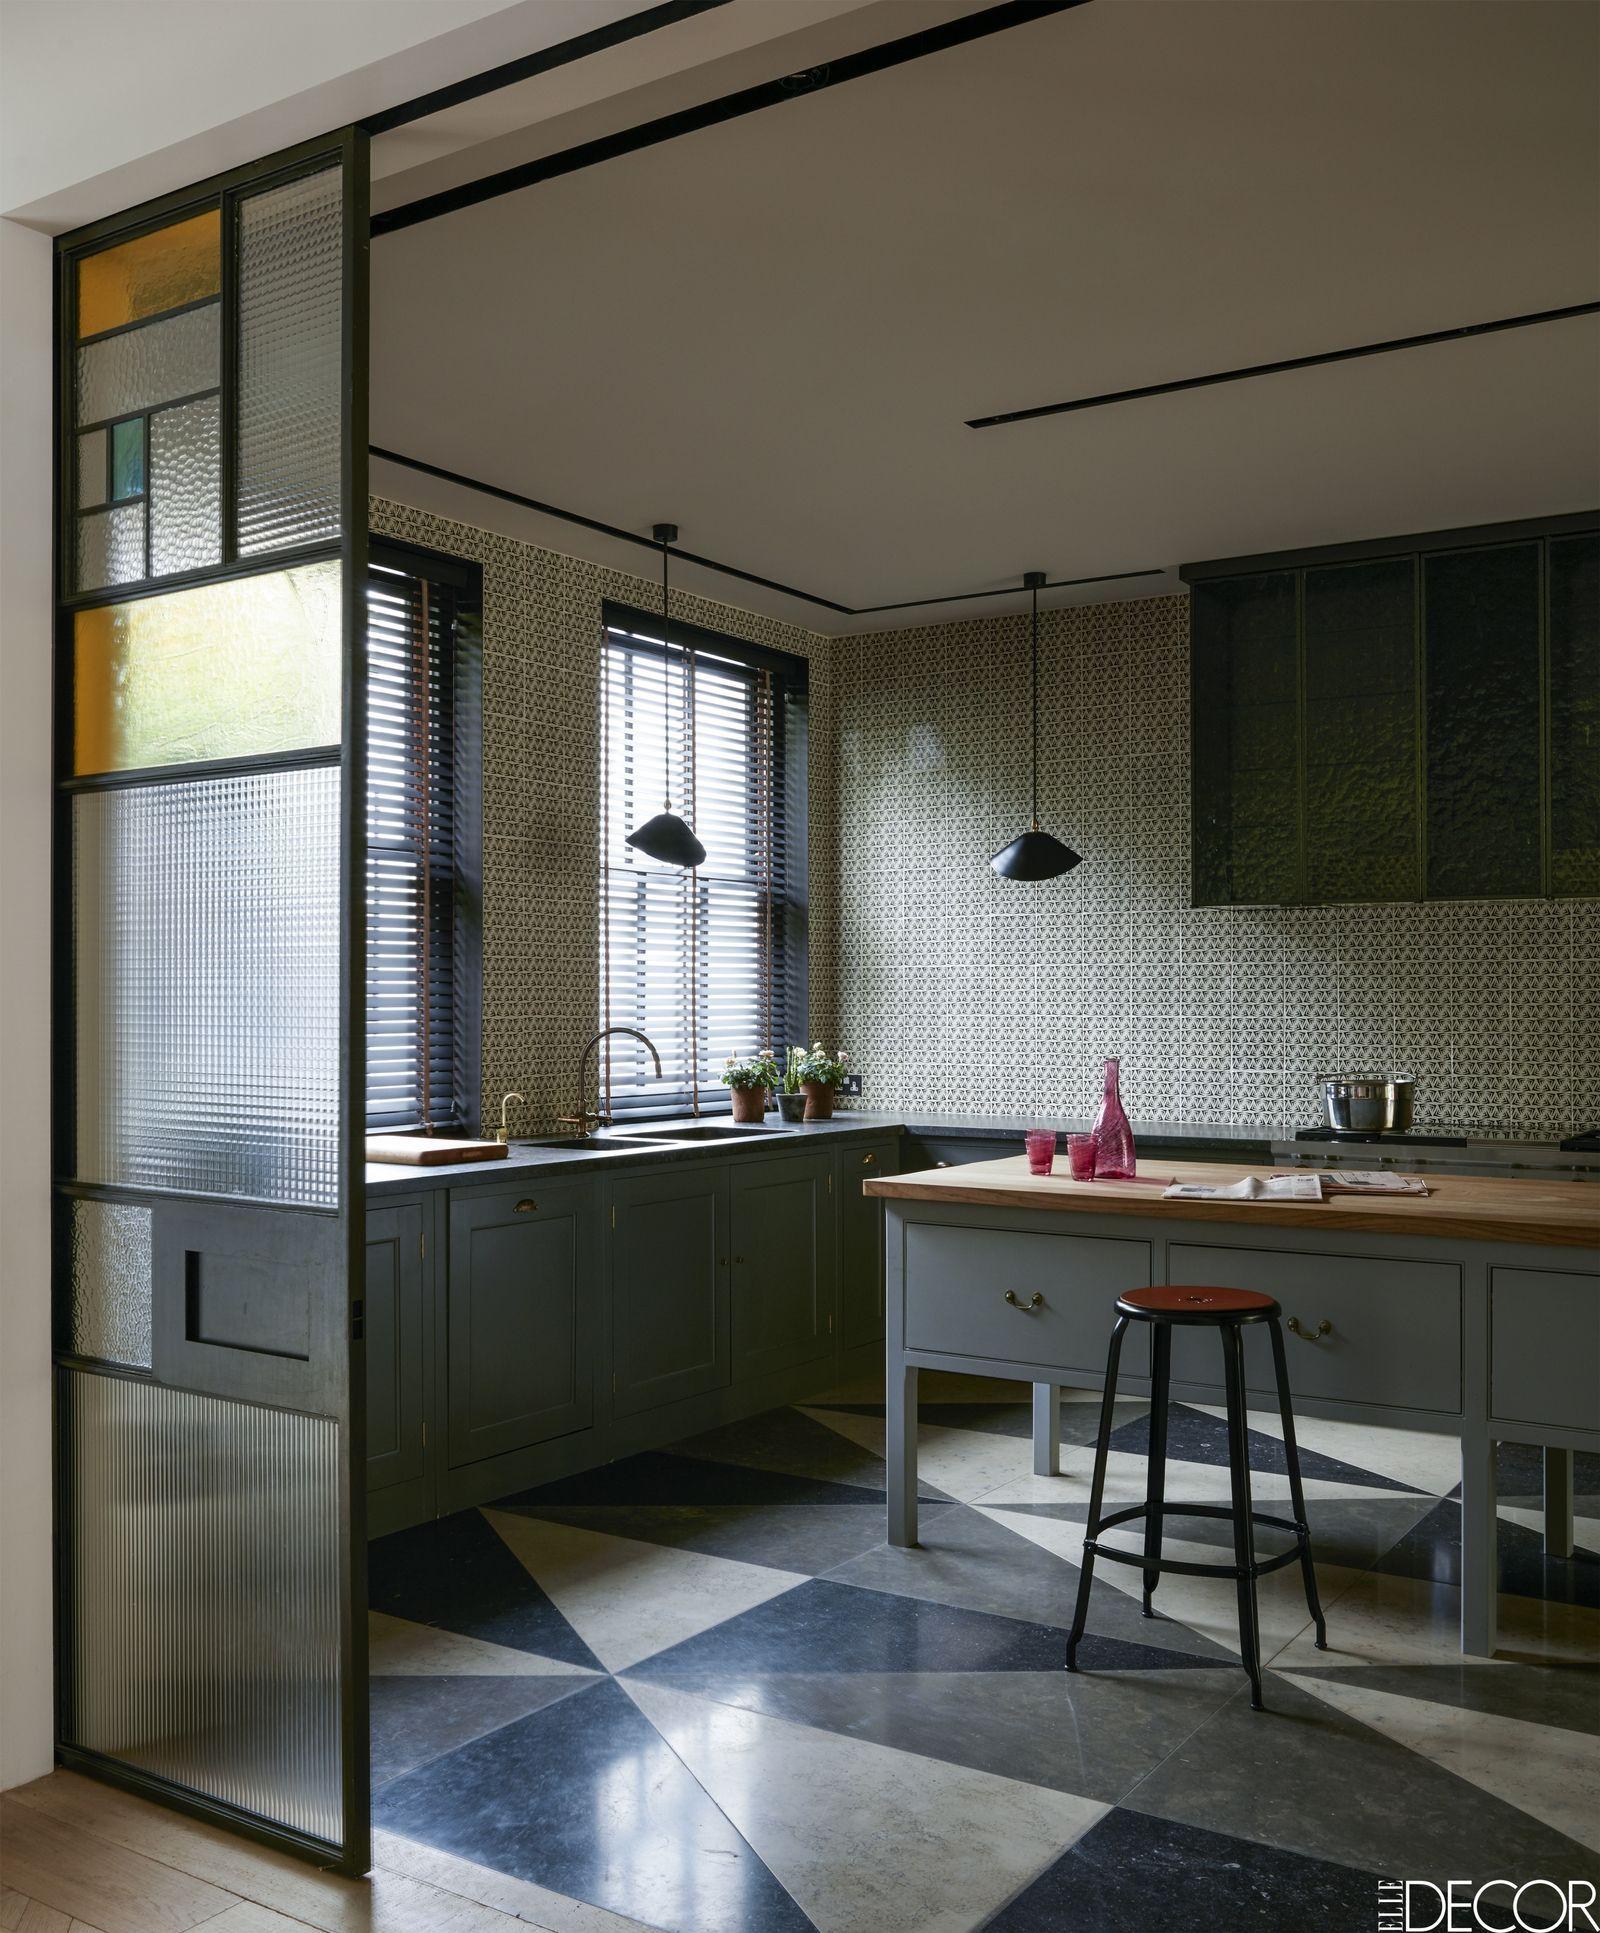 50 Unique Kitchen Lighting Fixtures That Make For Memorable Meals Amazing Townhouse Kitchen Design Ideas Review